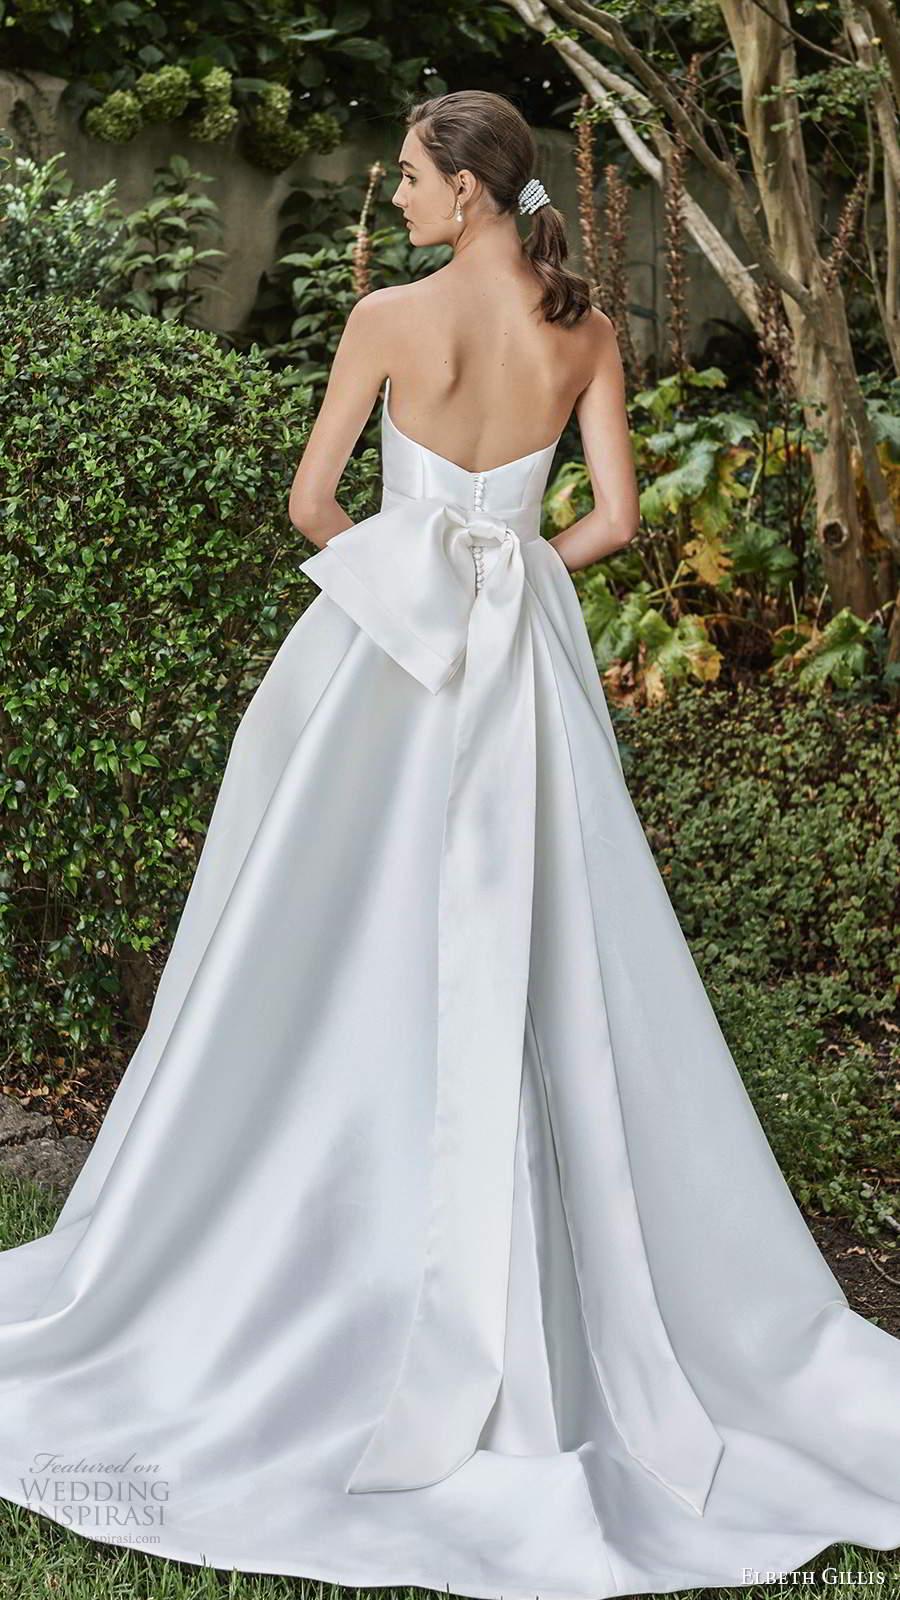 elbeth gillis 2021 bridal strapless straight across clean minimalist a line ball gown wedding dress slit skirt chapel train (10) bv